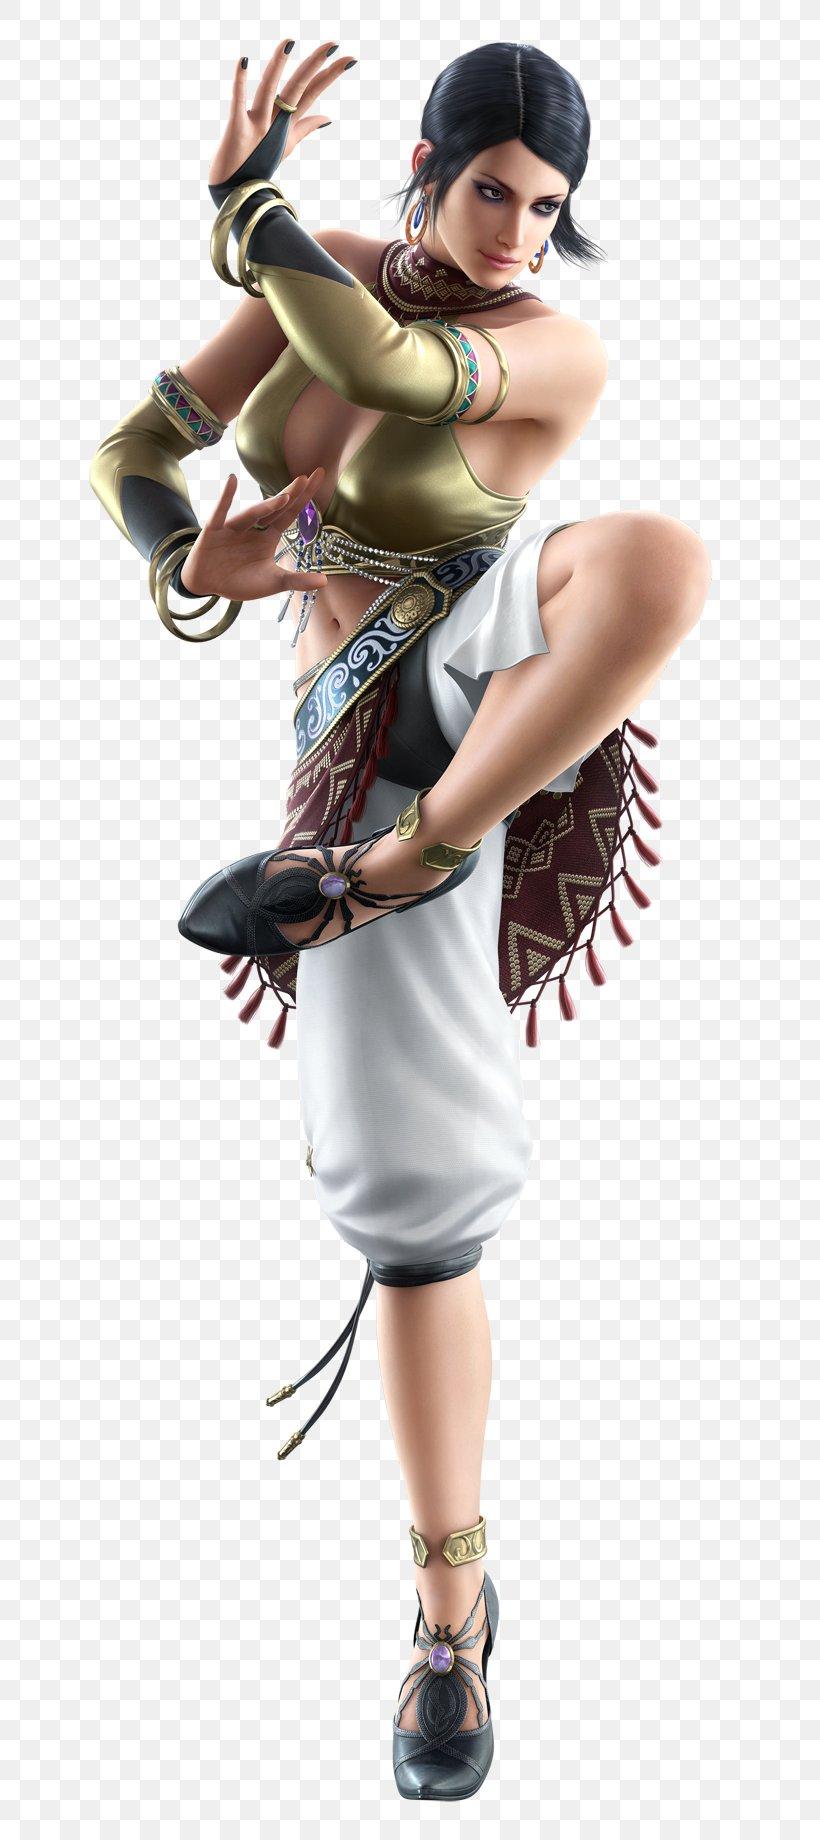 Tekken 6 Tekken Tag Tournament 2 Miguel Rojo Jin Kazama Png